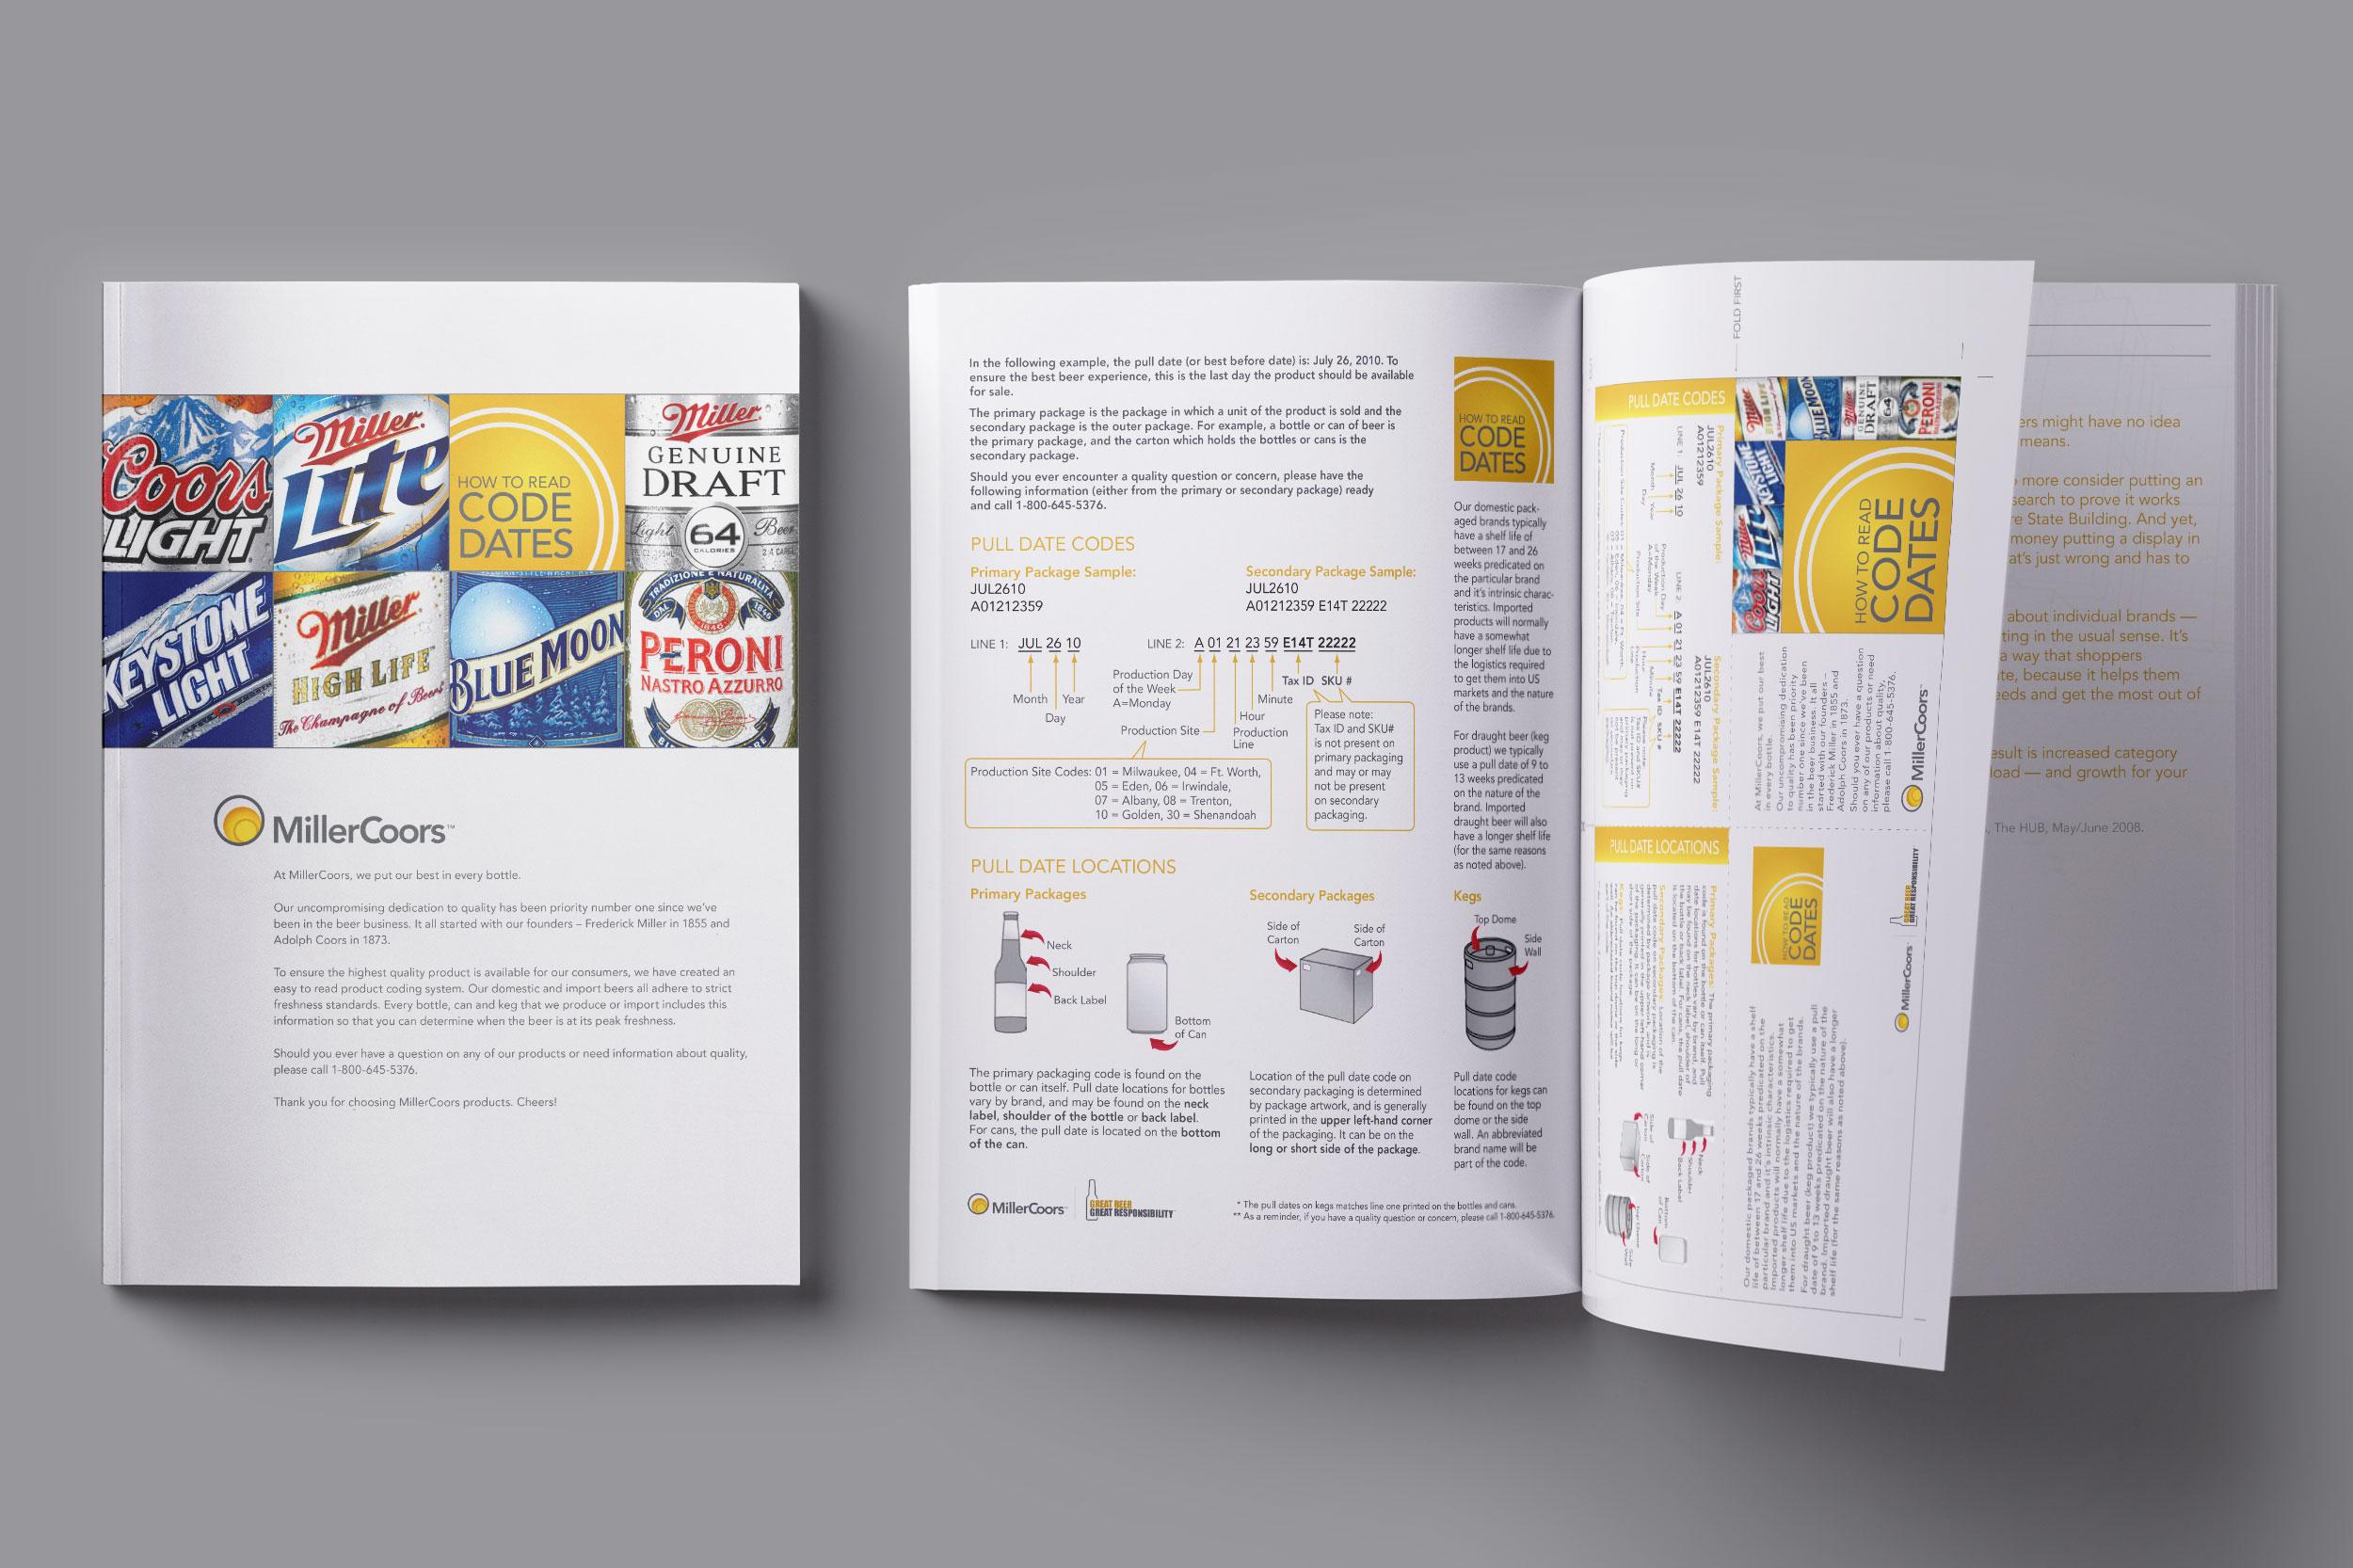 MillerCoors Code Dates Booklet (2009)